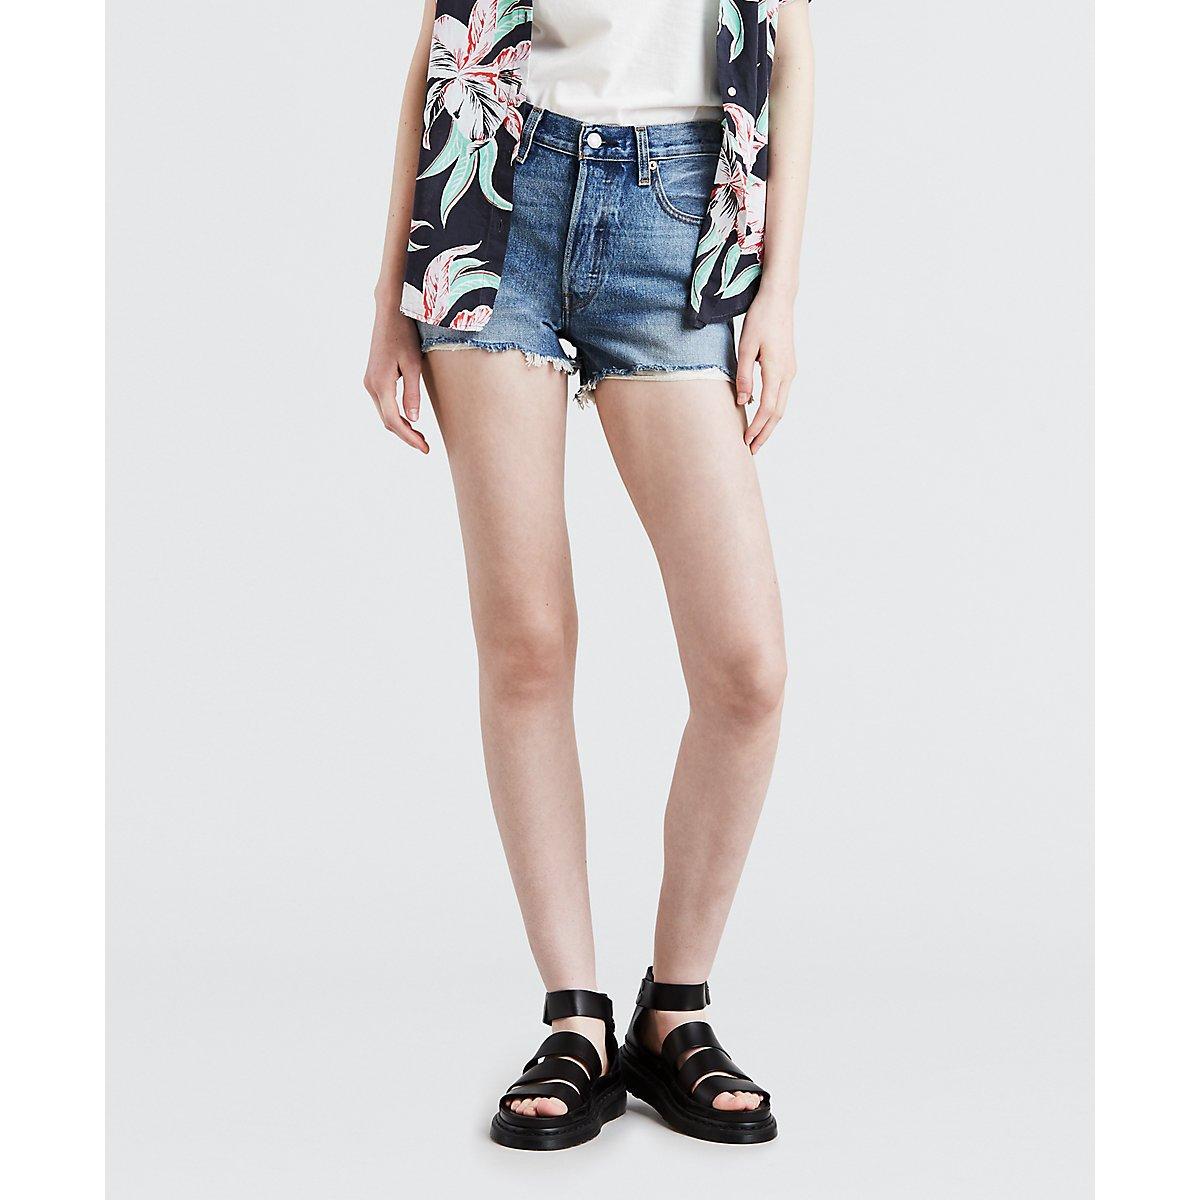 0880314c Levi's Women's 501 High Rise Short at Amazon Women's Clothing store: